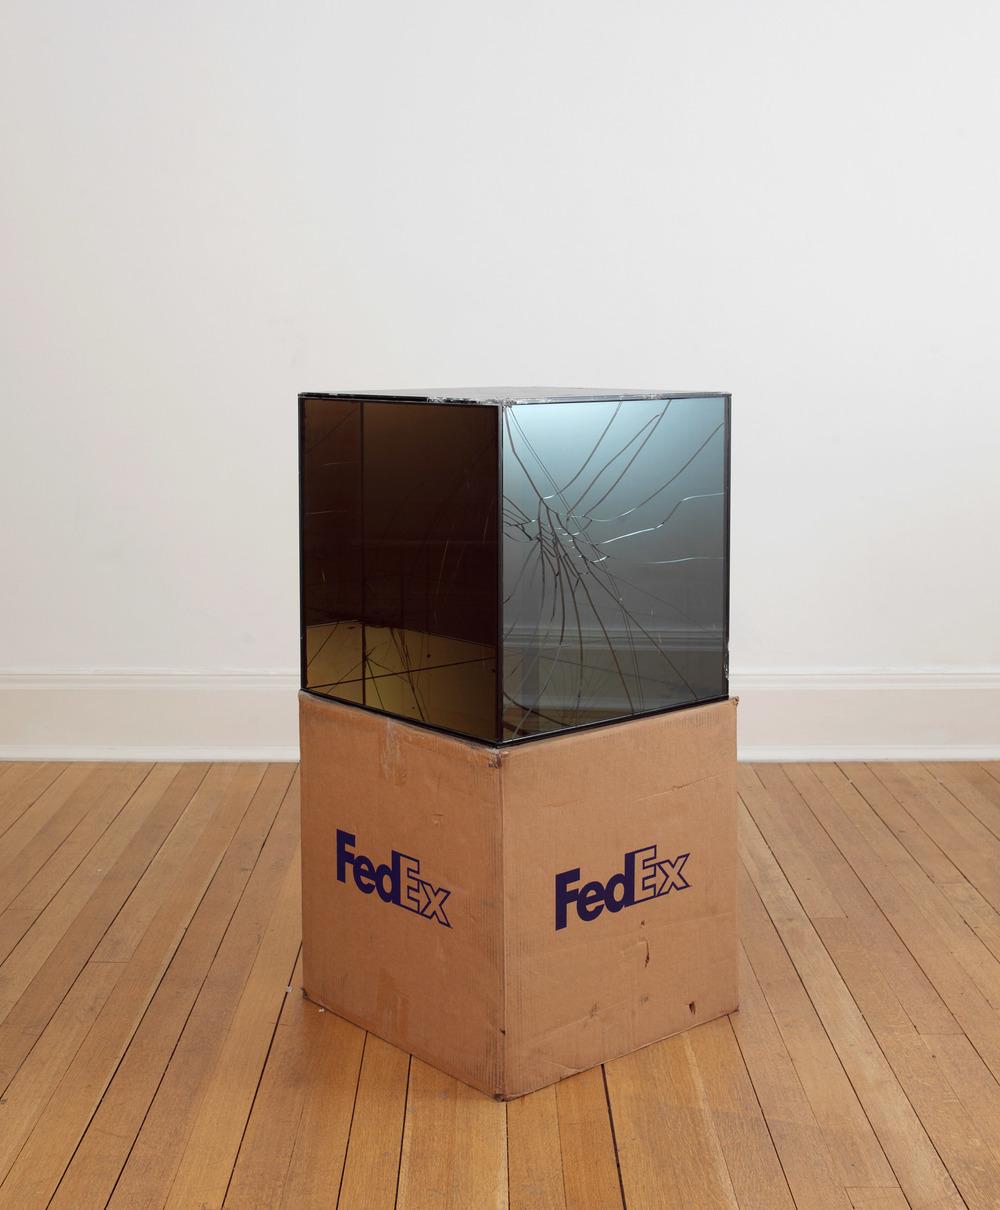 FedEx Large Kraft Box 2008 FEDEX 330510 REV 6/08 GP, International Priority, Los Angeles–London trk#868587728072, October 02–05, 2009    2009–   Laminated Mirropane, FedEx shipping box, accrued FedEx shipping and tracking labels, silicone, metal, tape  20 x 20 x 20 inches   Production Stills, 2009